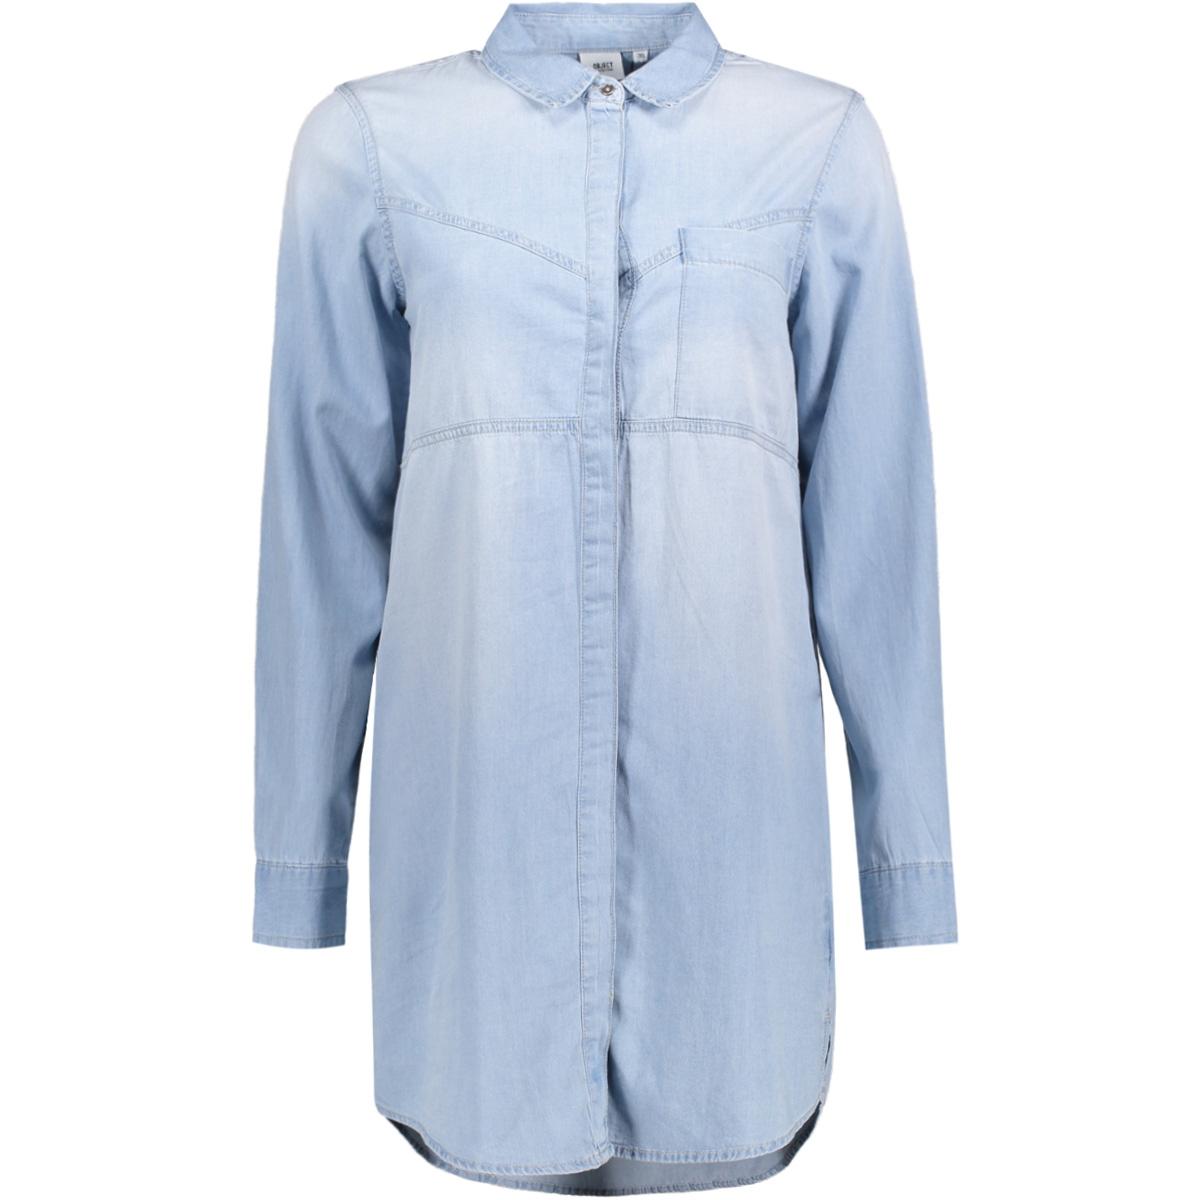 objdale l/s chambray long  shirt .i 23024038 object tuniek light blue denim